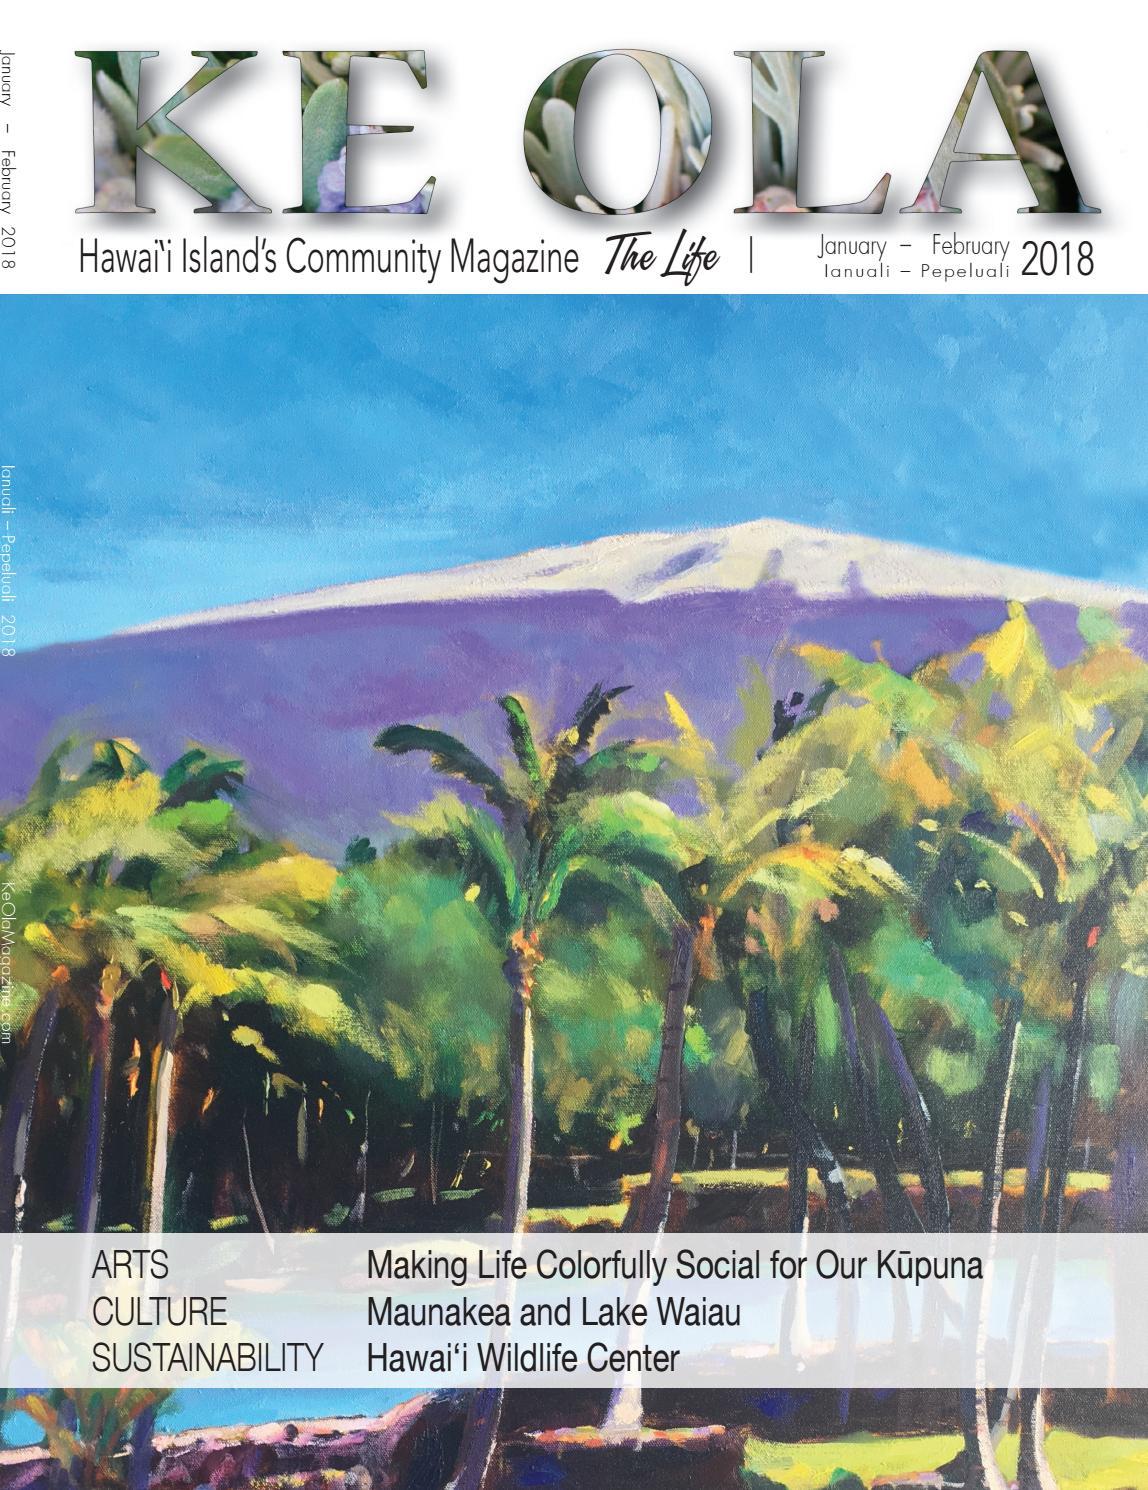 b3c56d8bd January-February 2018 by Ke Ola Magazine - issuu